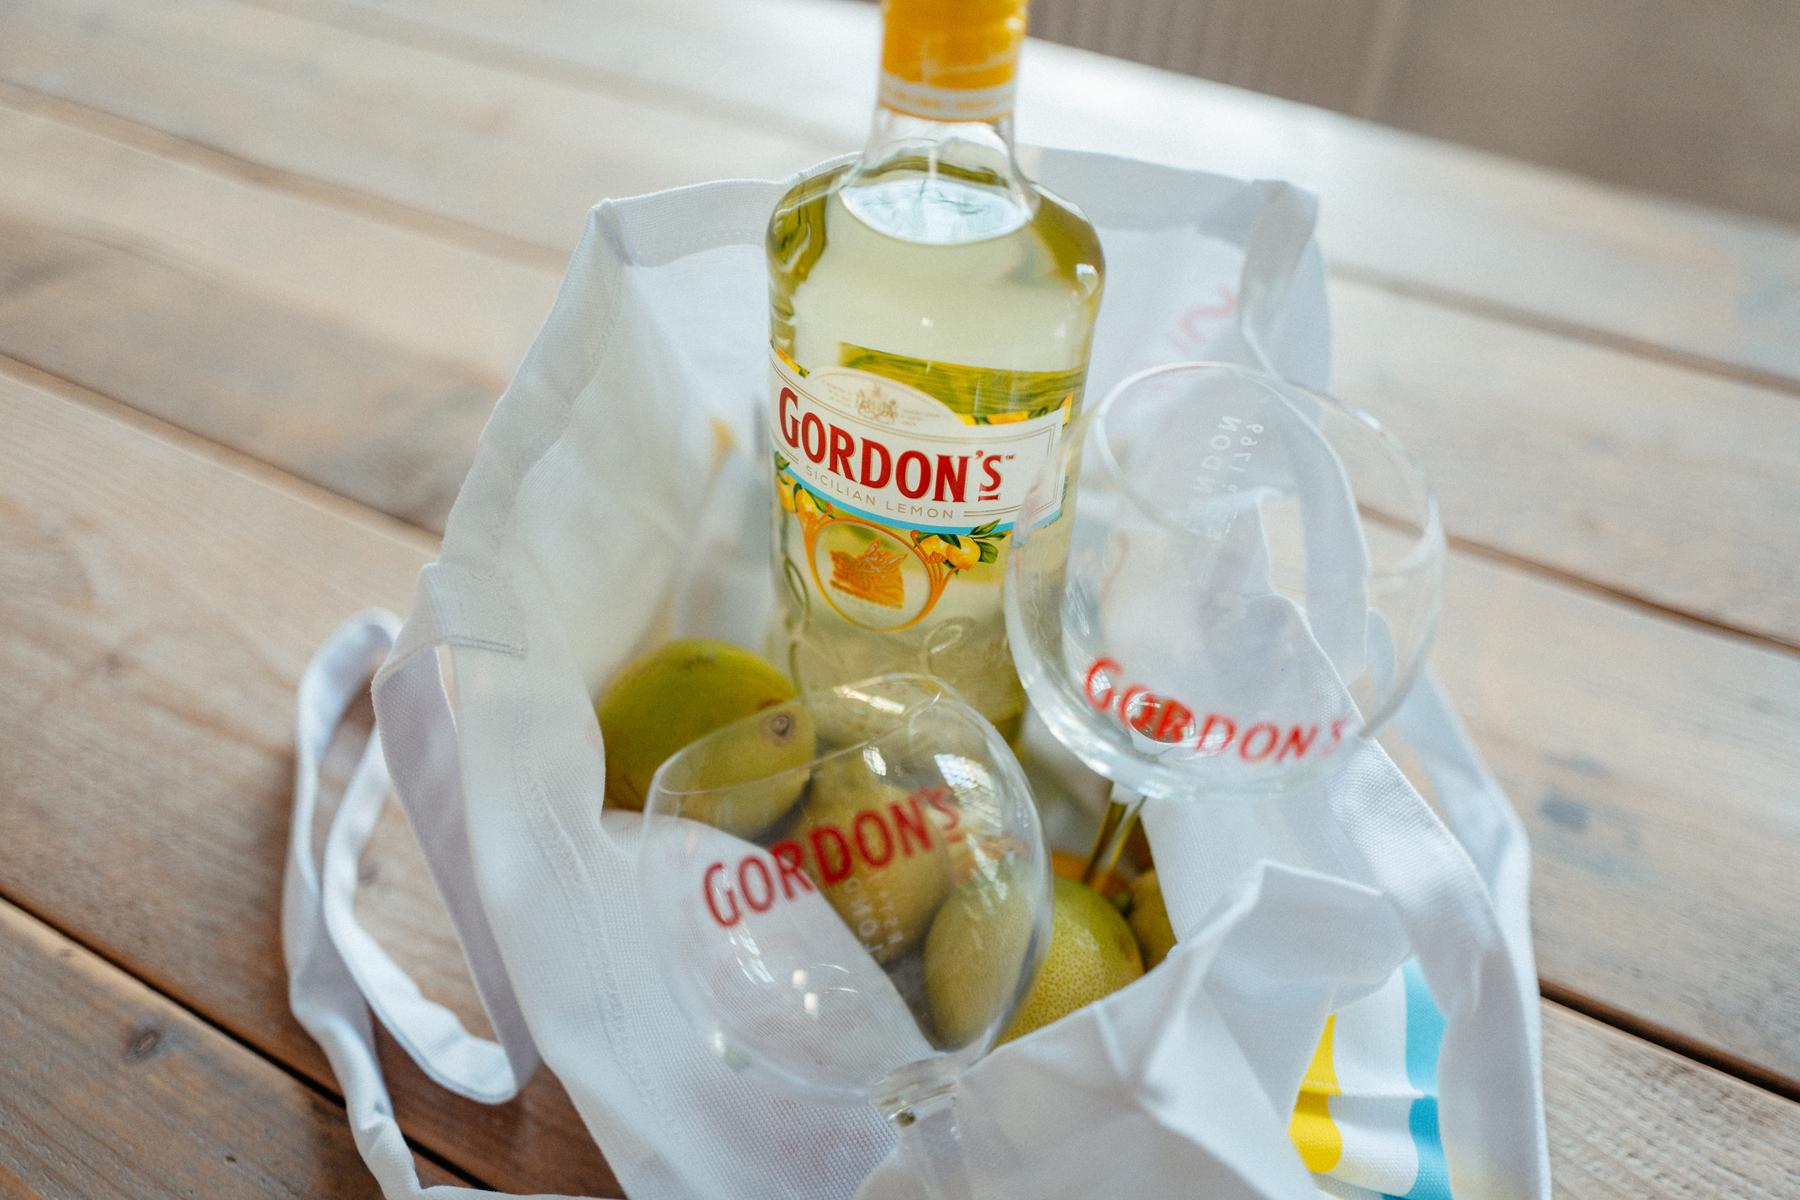 Geheimtipp Hamburg Gordons Gin Sicilian Lemon Dahlina Sophie Kock 002